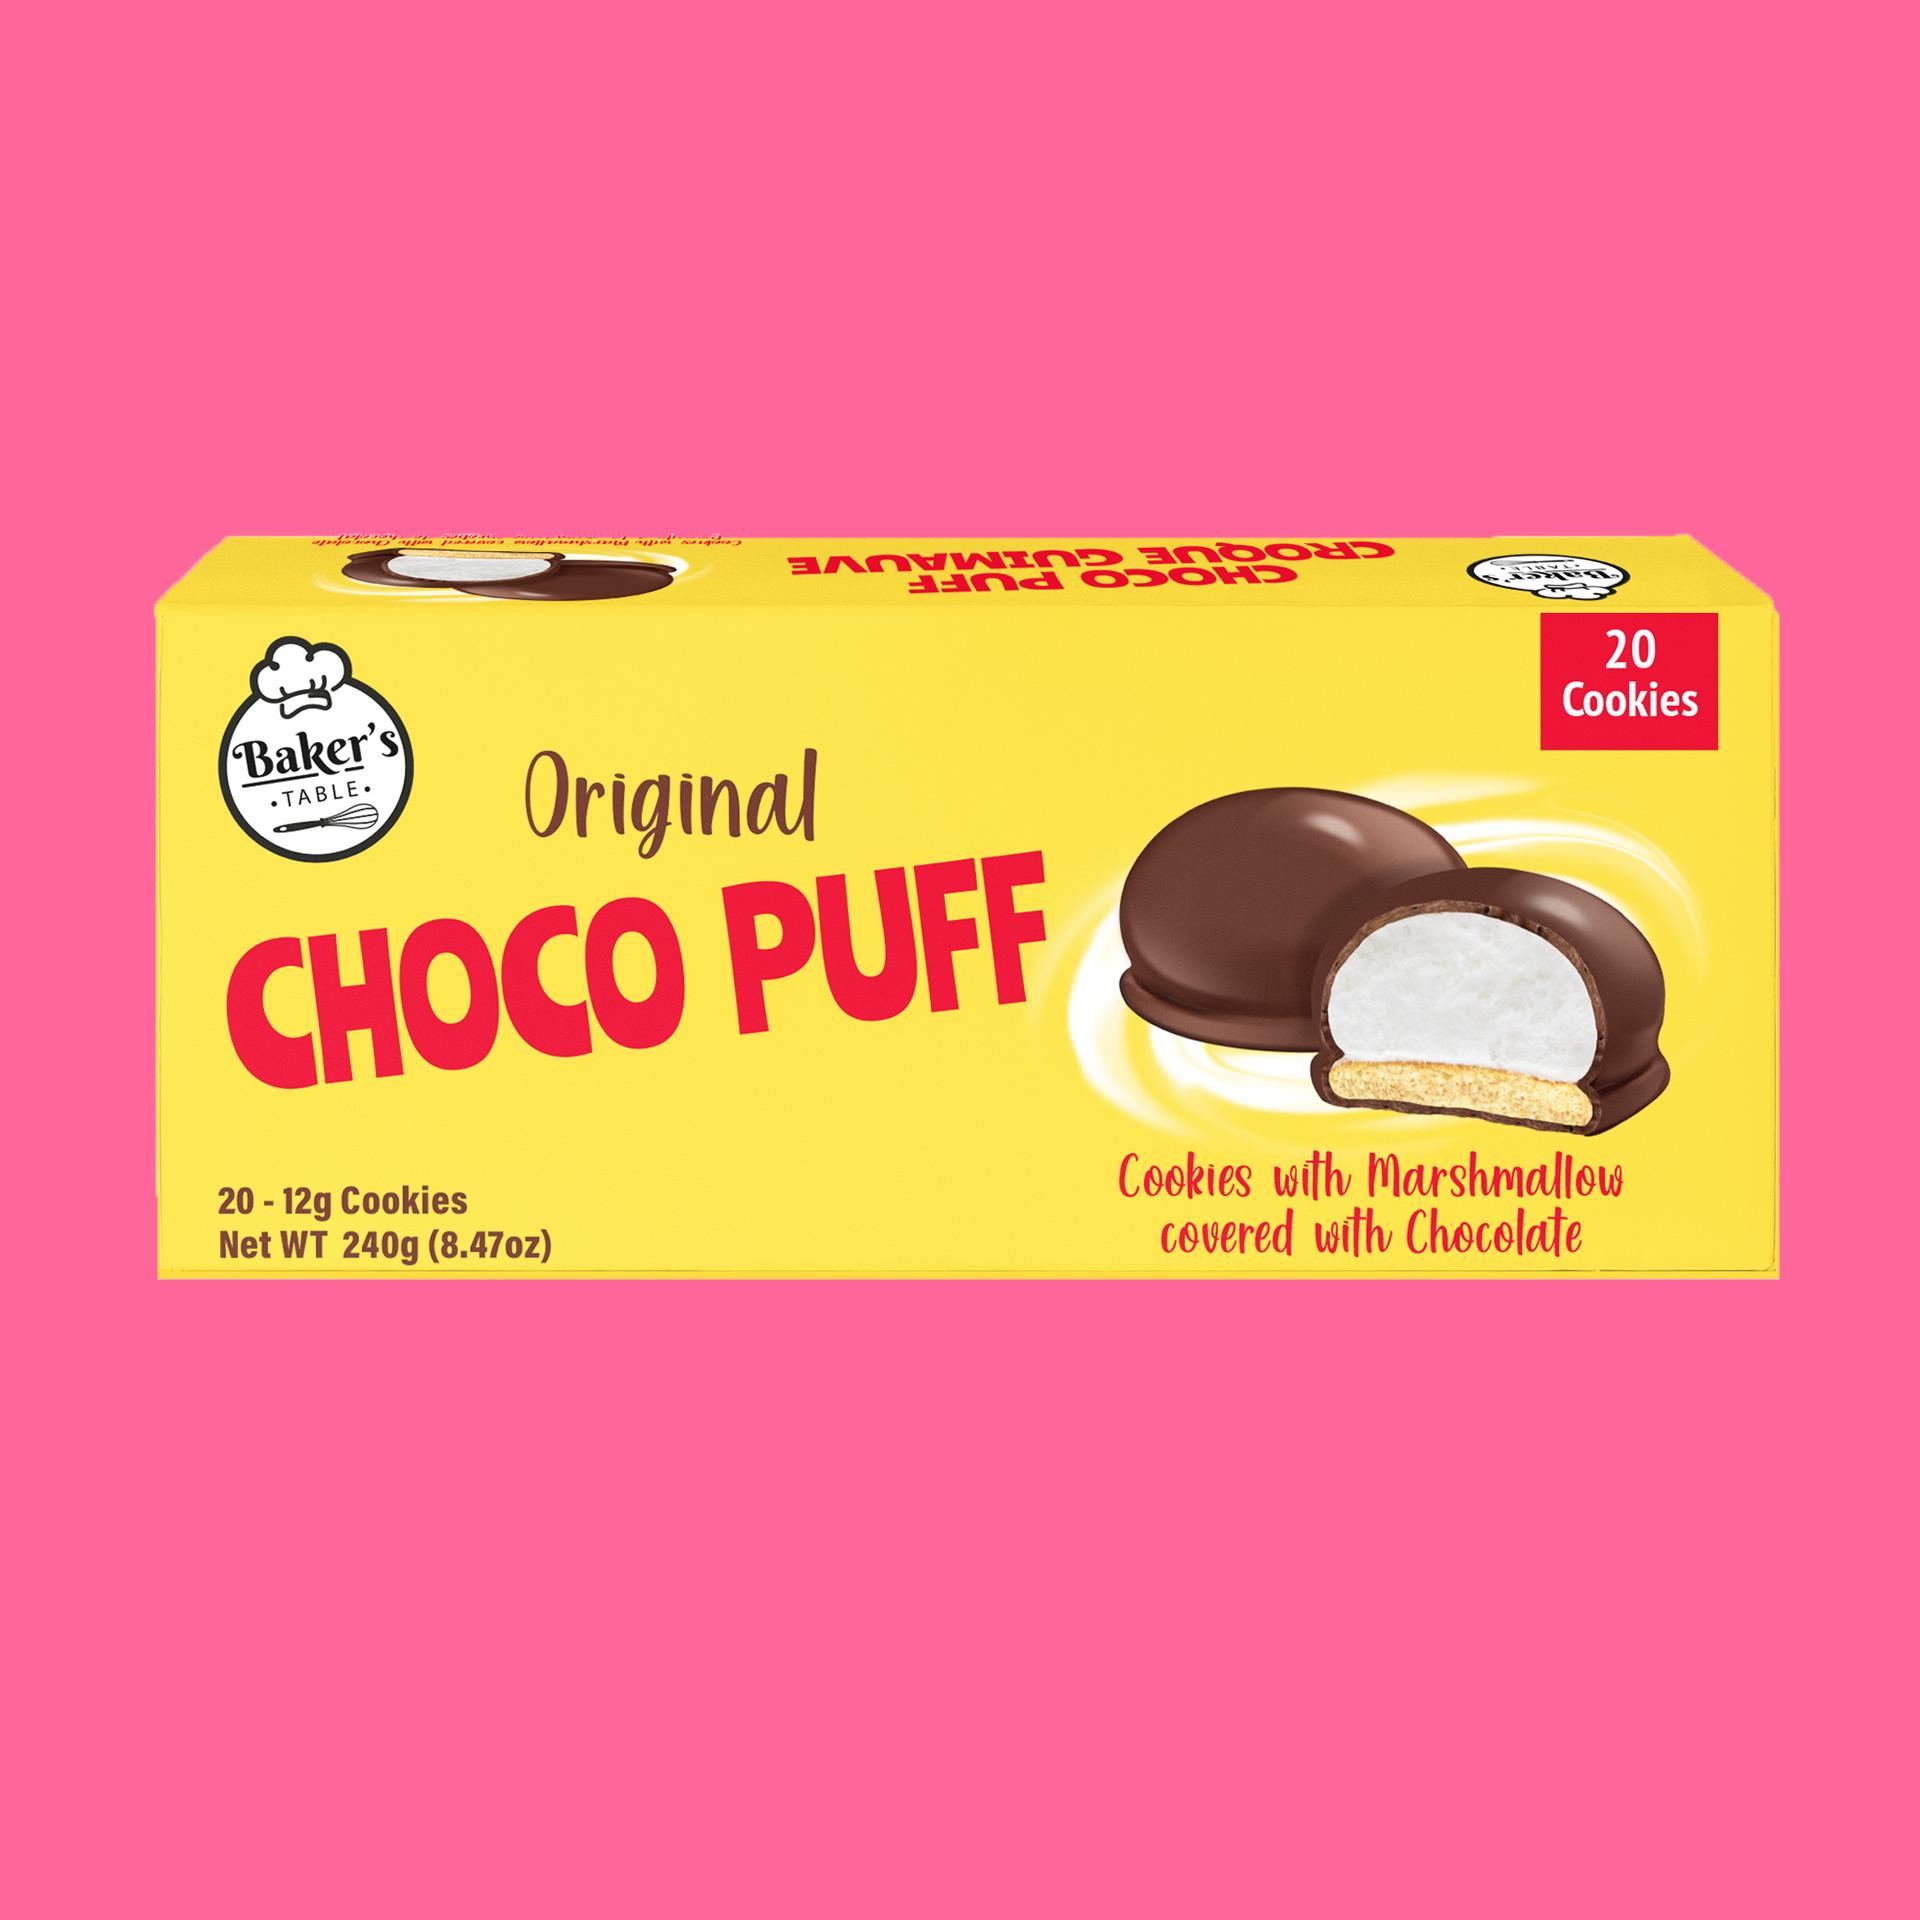 https://exclusivebrands.ca/wp-content/uploads/2021/04/BT_Choco-Puff_Orig.png